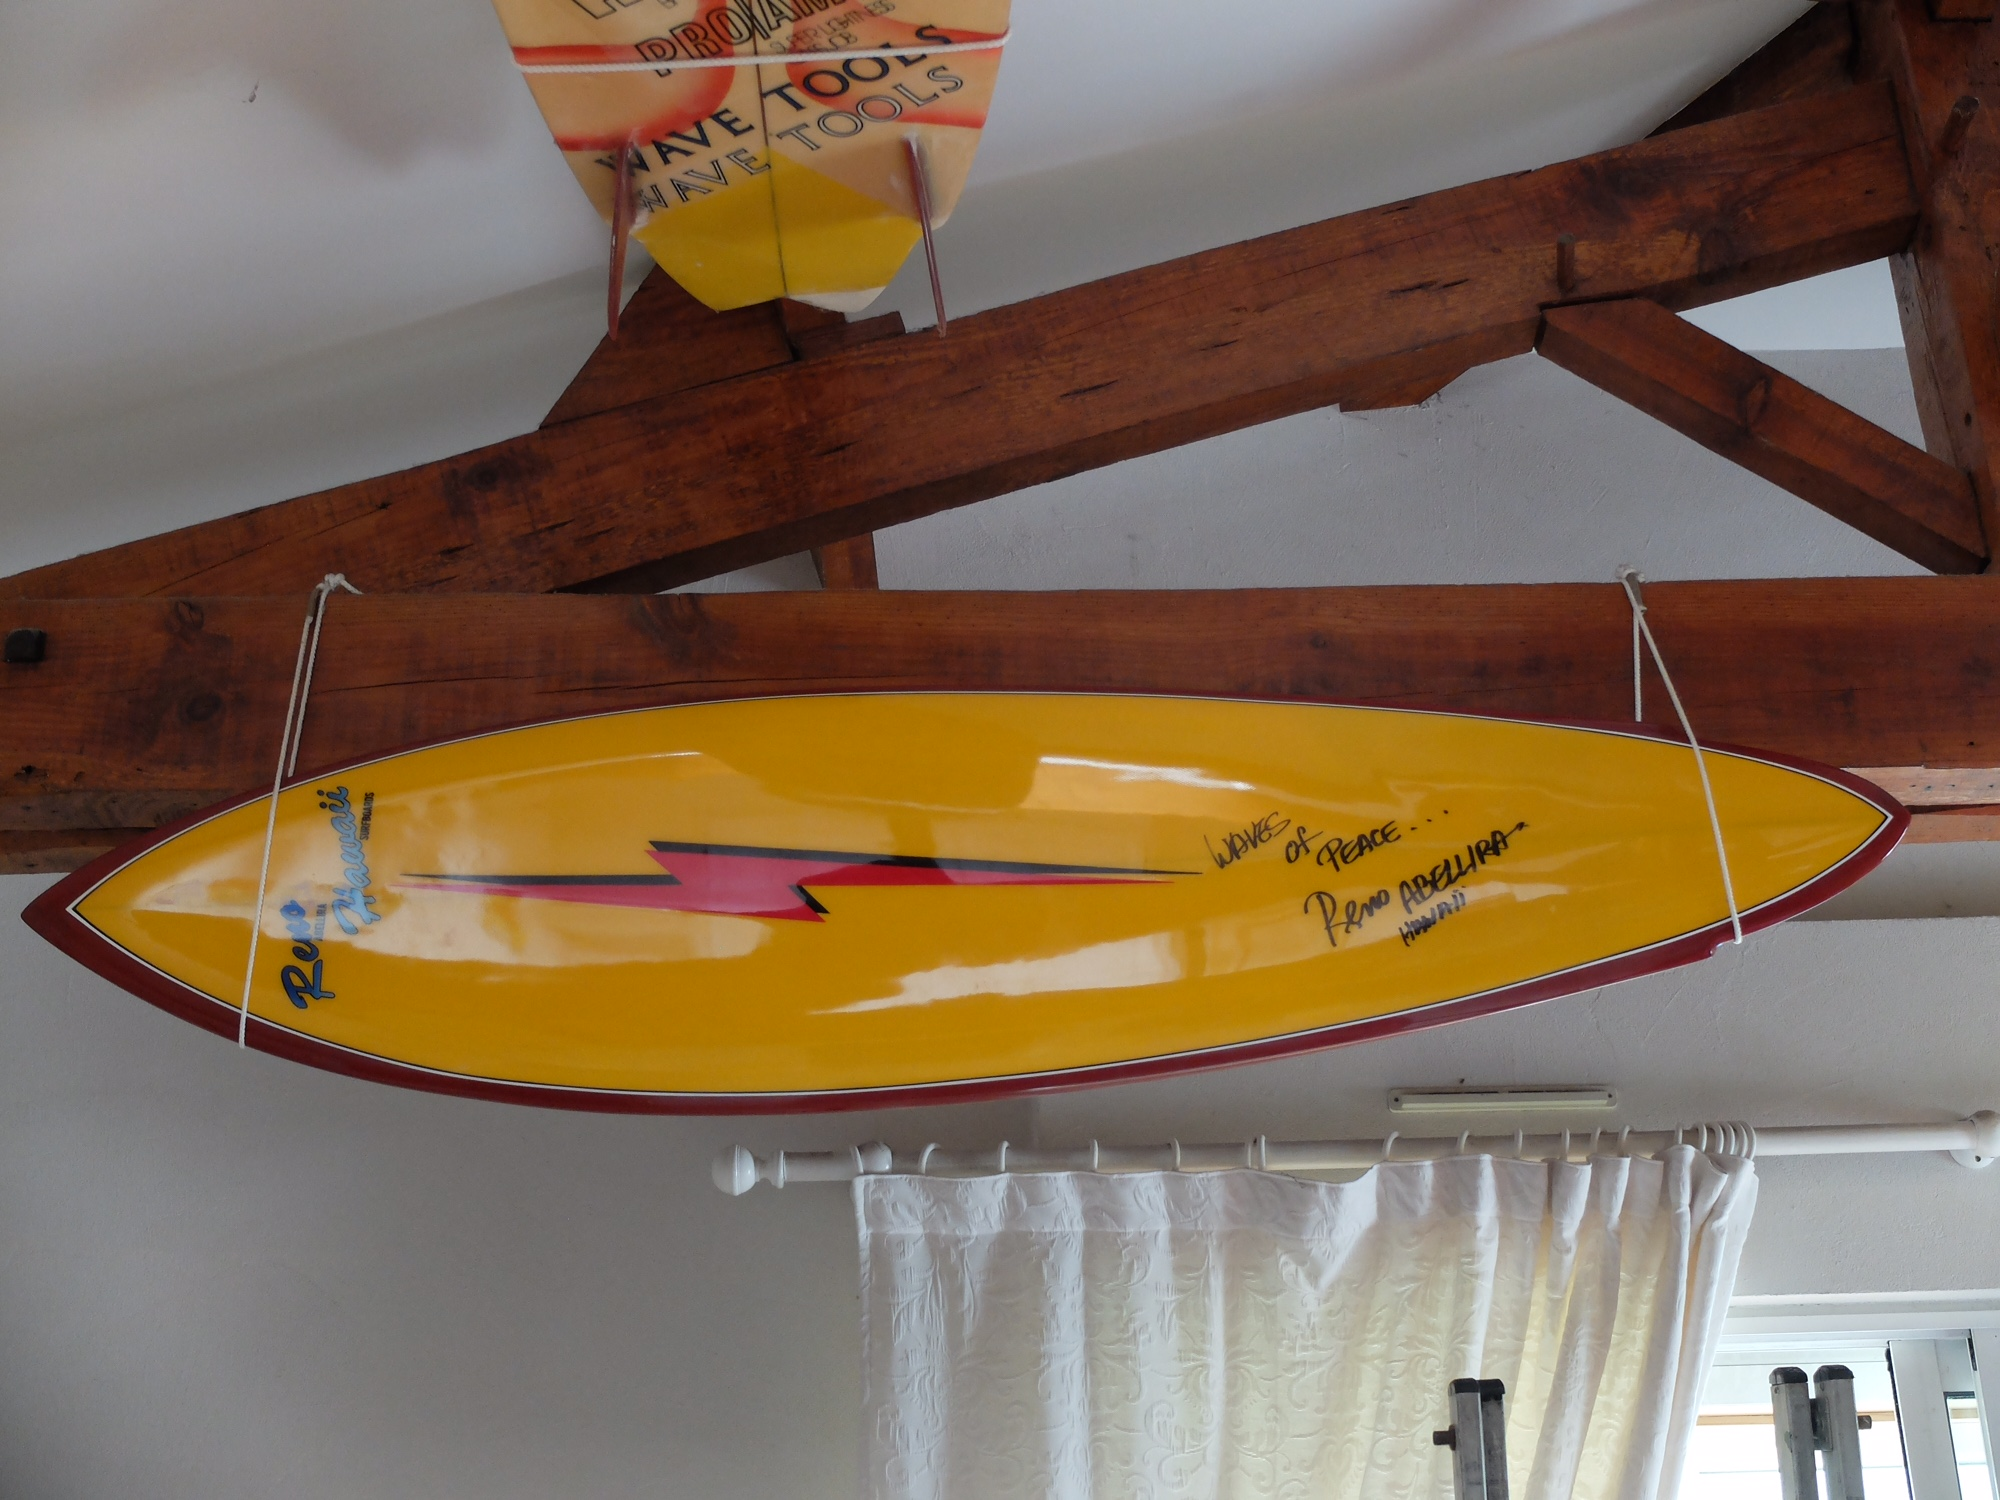 Reno-Abellira-Ligntning-Bolt-Surfboards-2